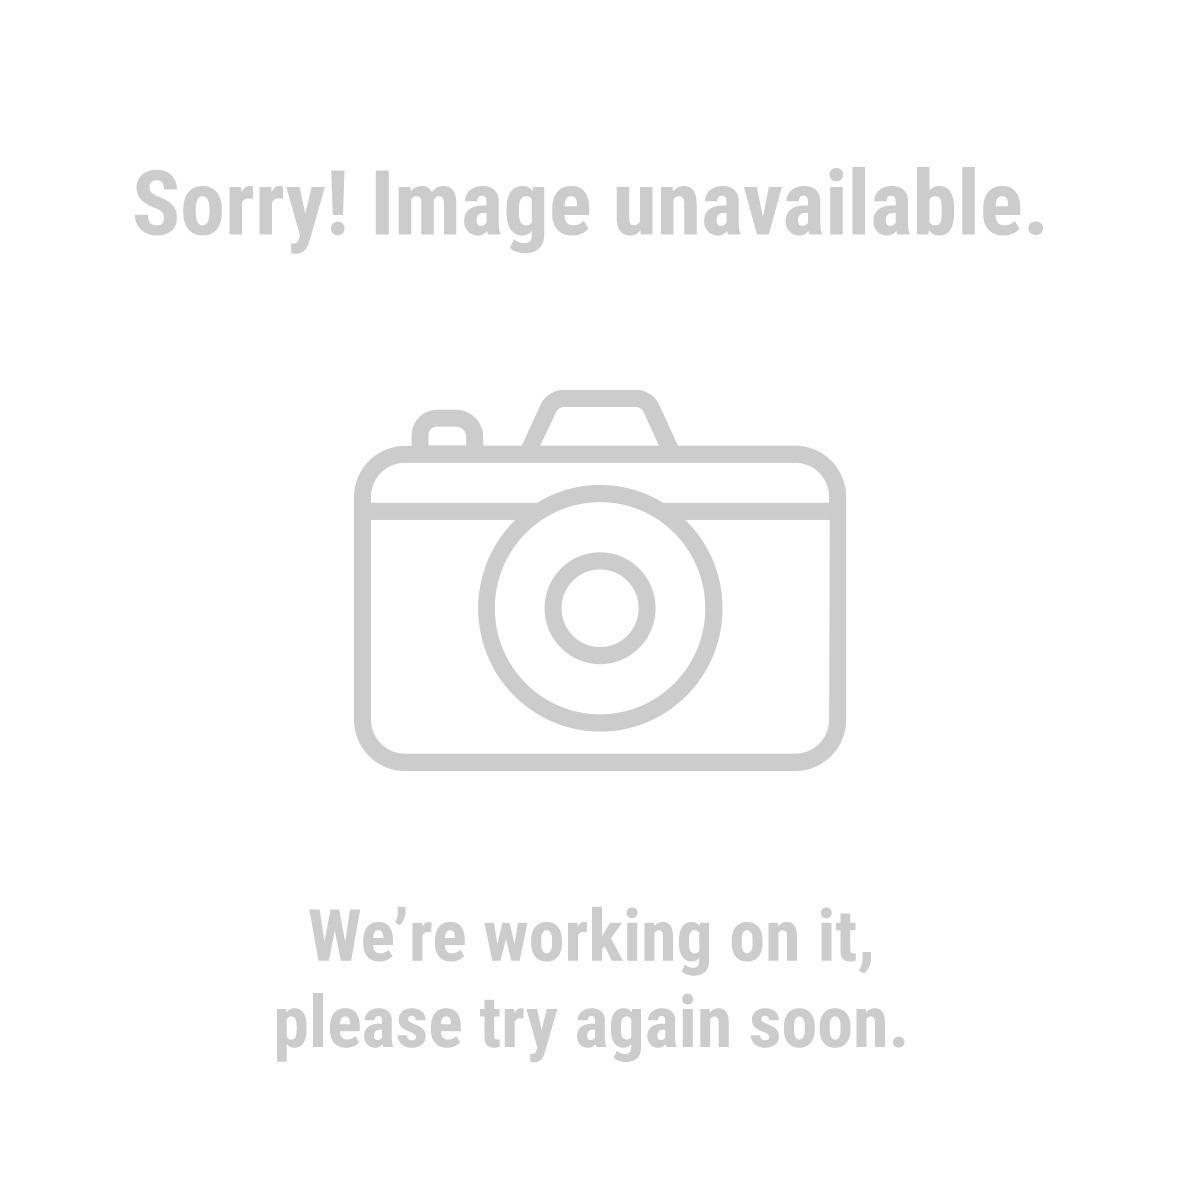 HFT 61464 Masking Tape